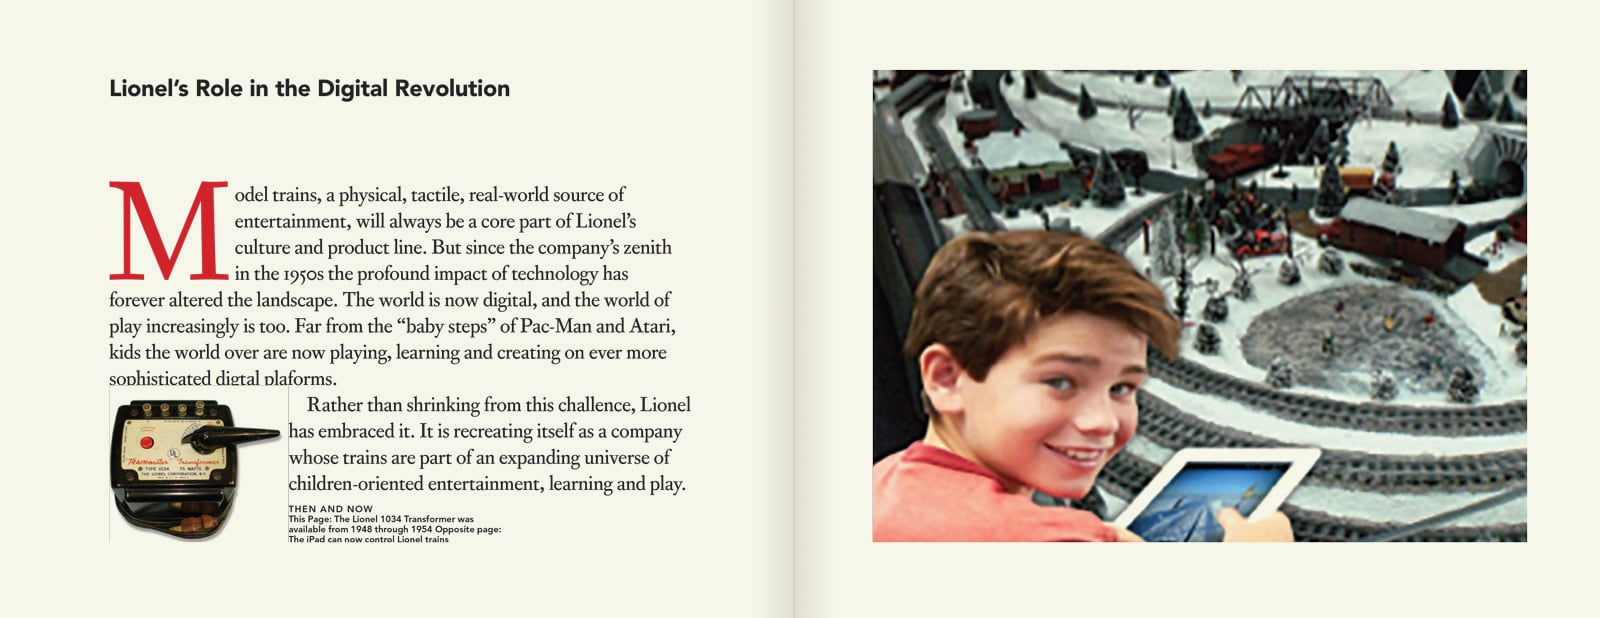 8-Lionel_Book-digital.jpg